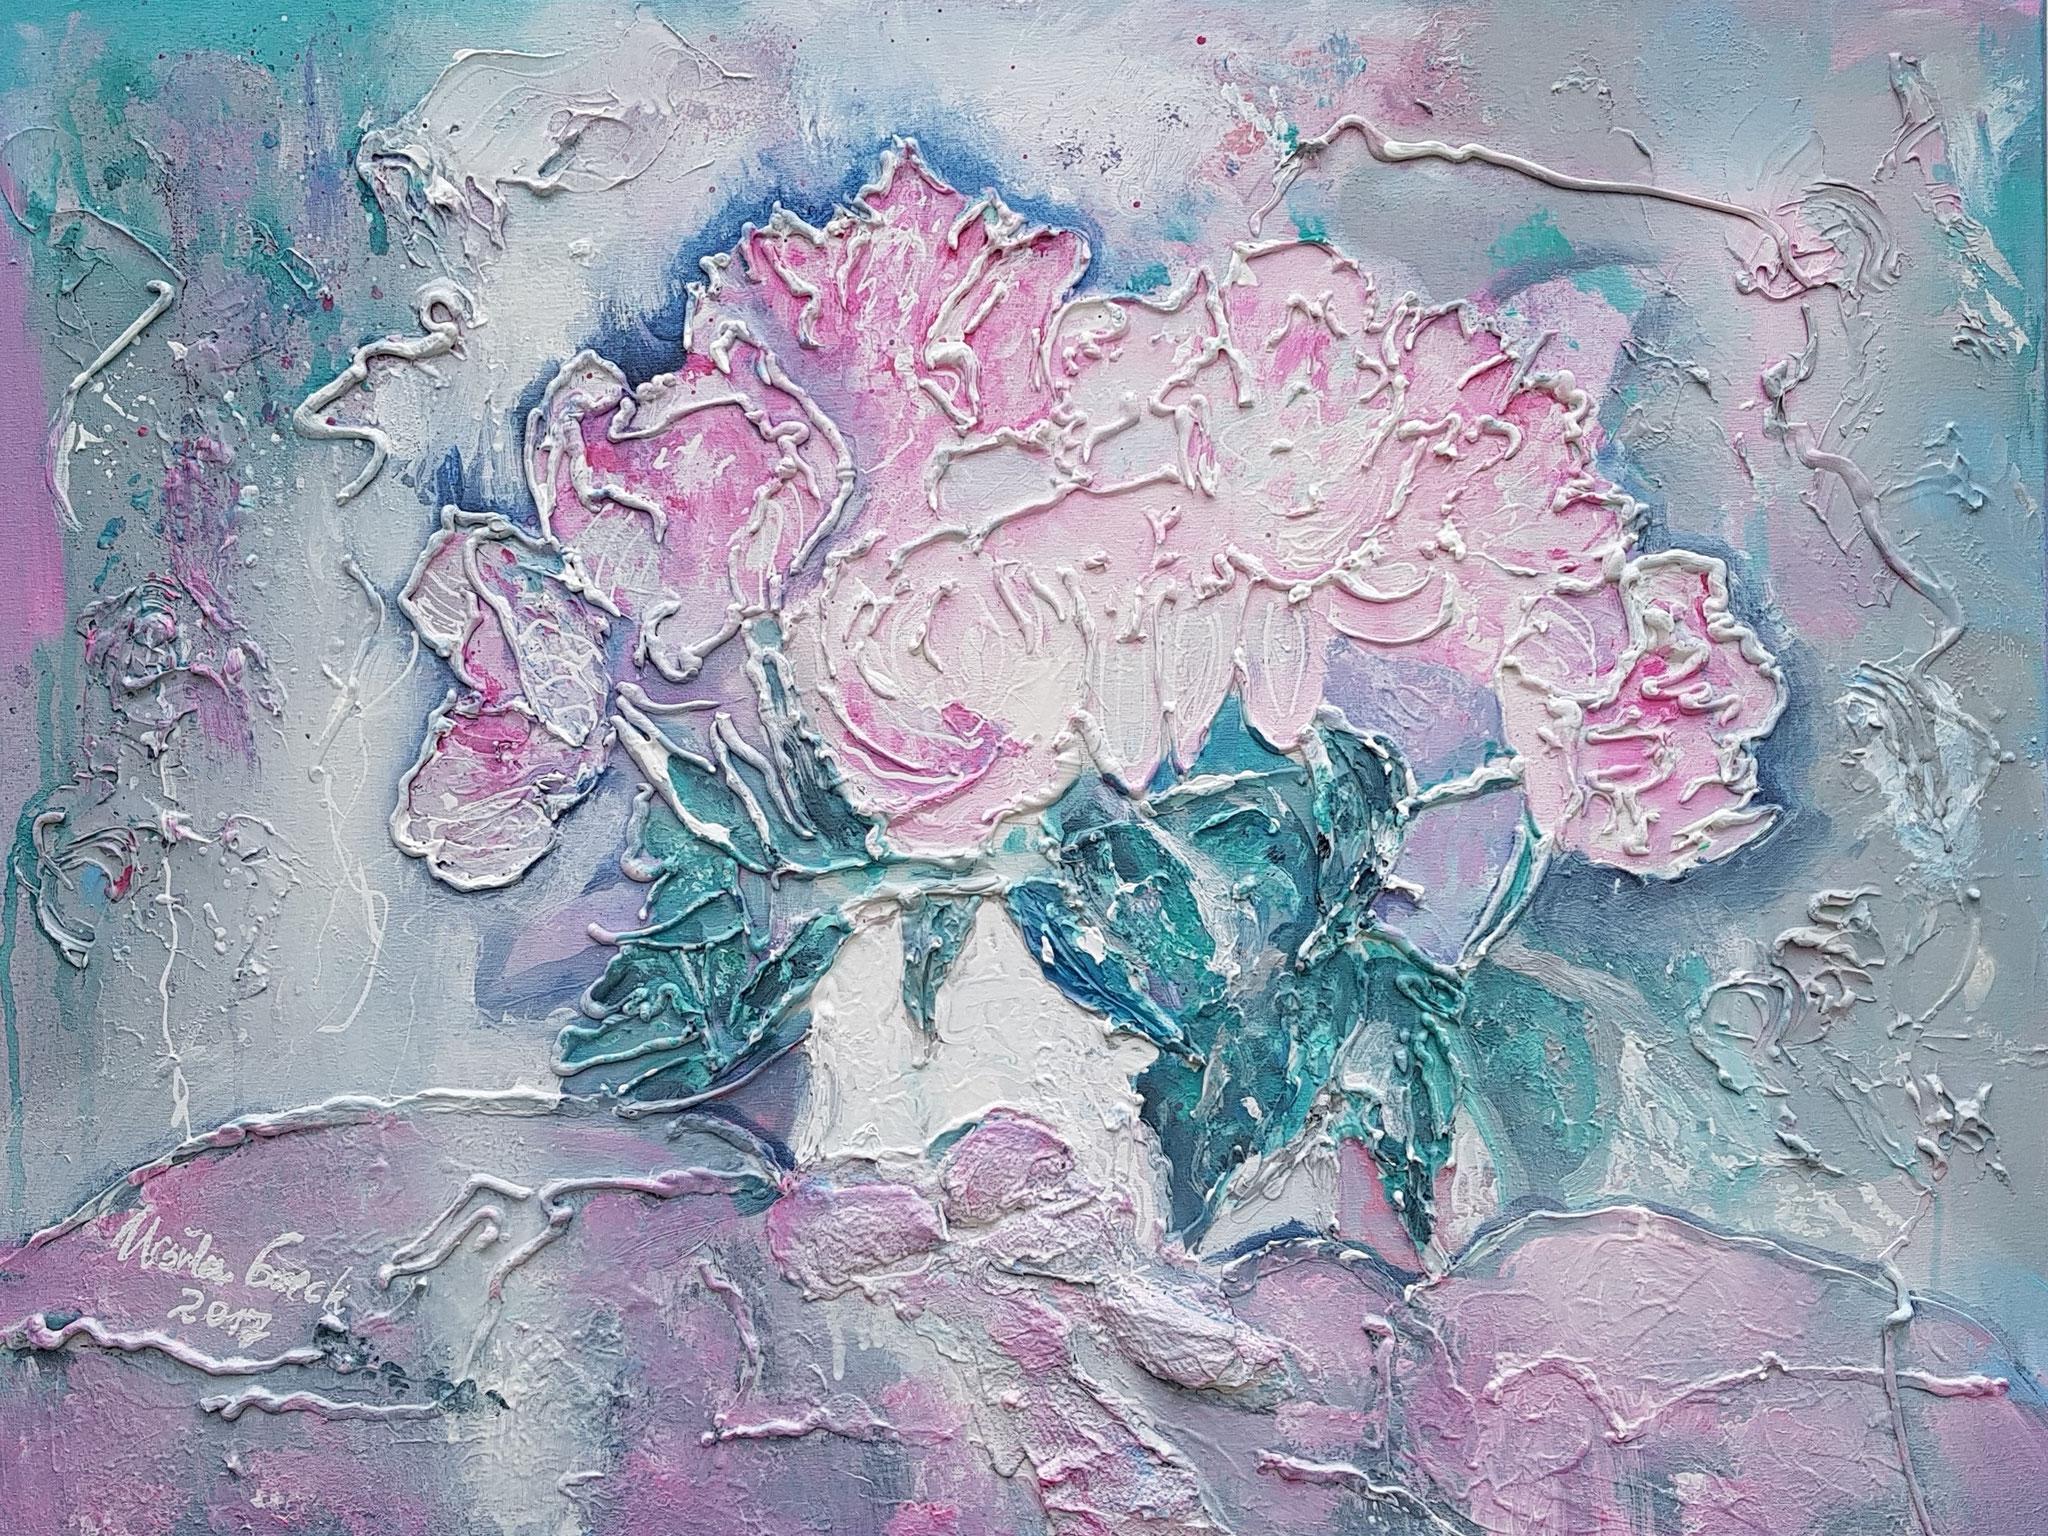 La vie en rose (Technik: Acryl/Mixed Media auf Leinwand 80 X 60 cm)